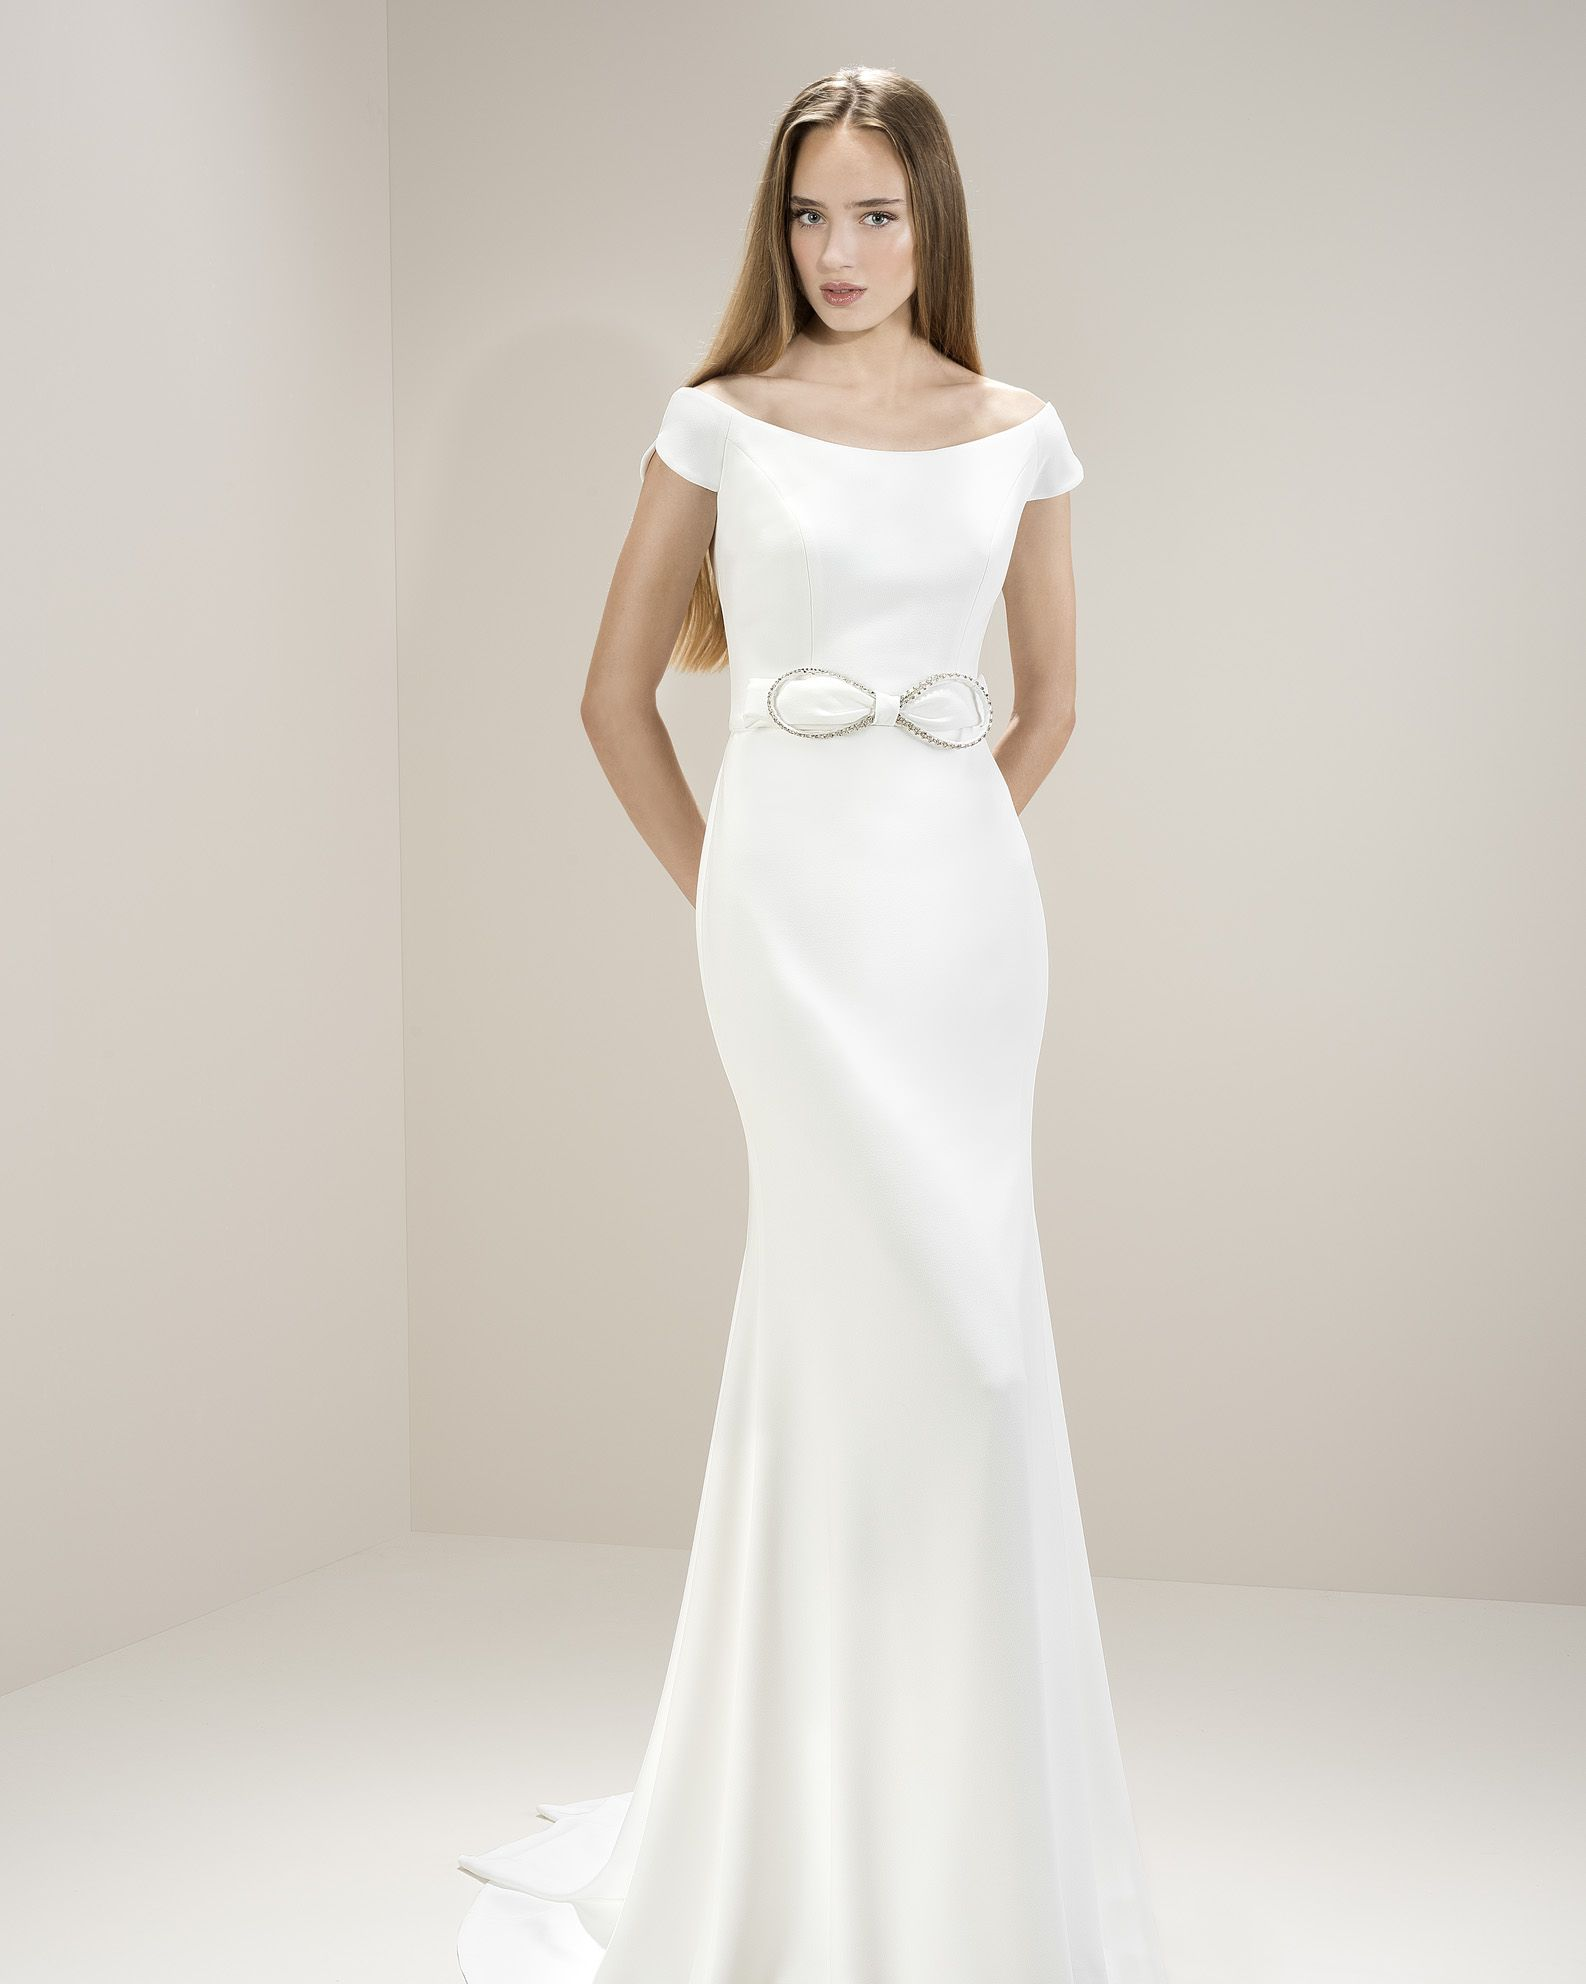 Jesus Peiro Wedding Dresses At Miss Bush Bridal Boutique In Surrey Wedding Dress Outlet Wedding Dresses Wedding Dresses Images